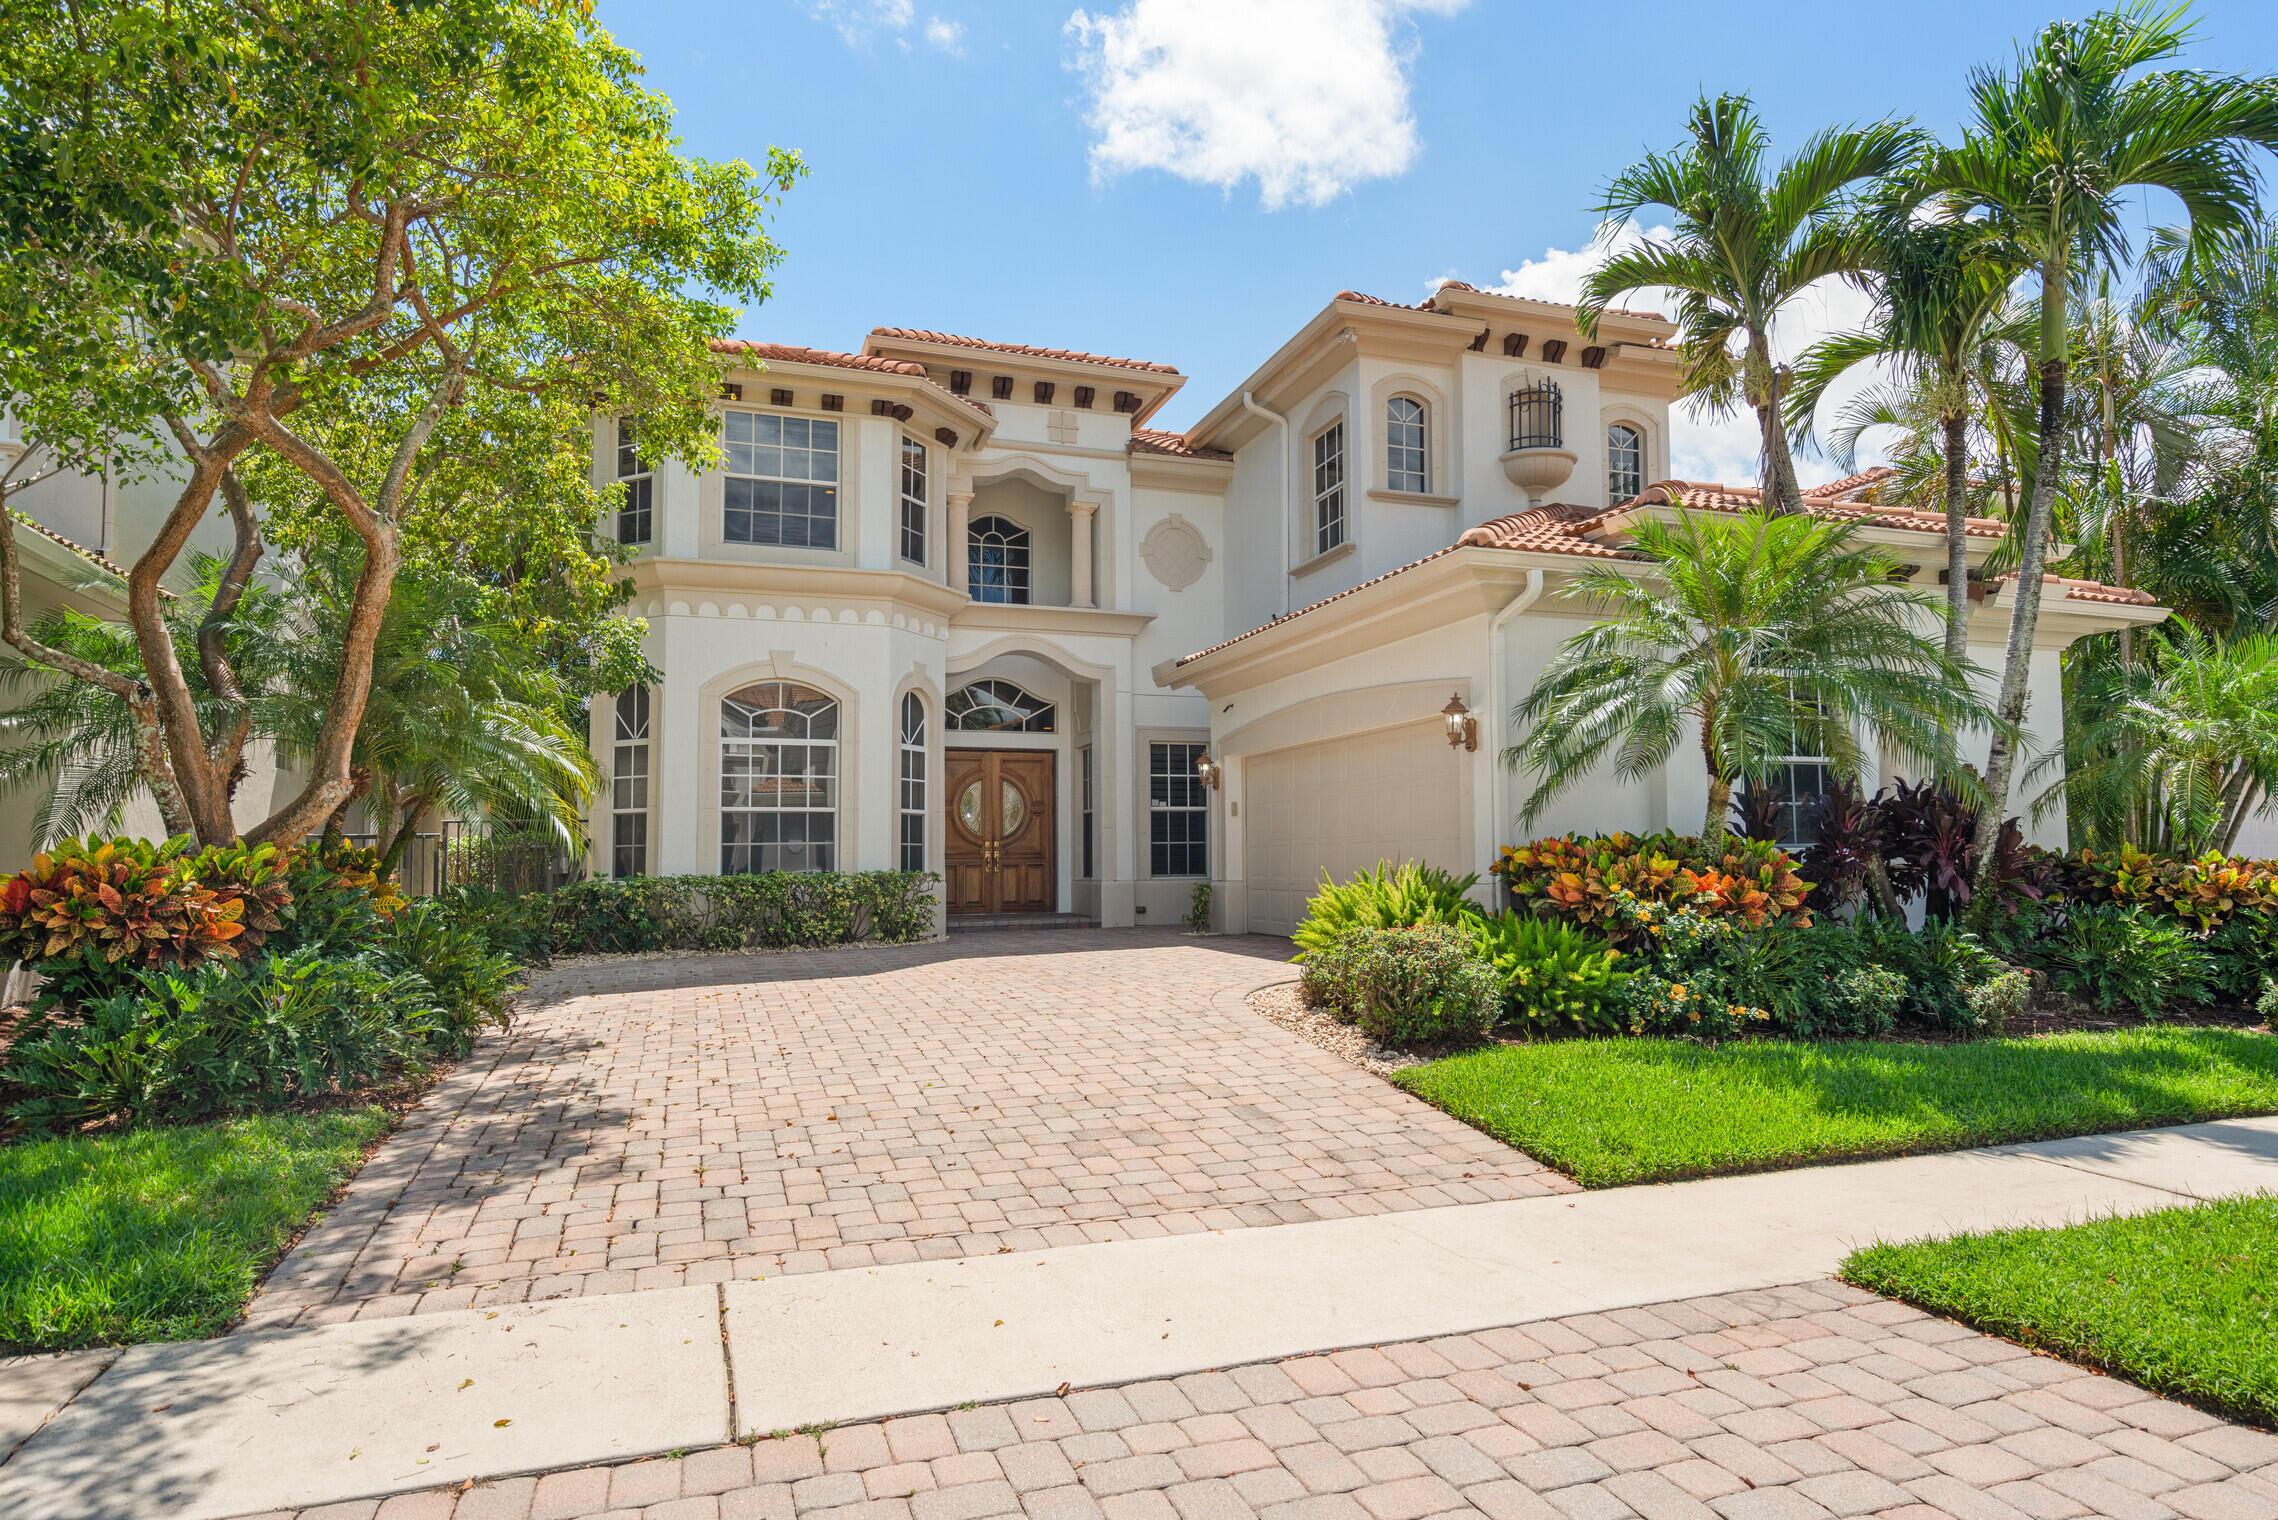 8174 Valhalla Drive, Delray Beach, Florida 33446, 4 Bedrooms Bedrooms, ,6 BathroomsBathrooms,Single Family Detached,For Sale,Valhalla,RX-10746456